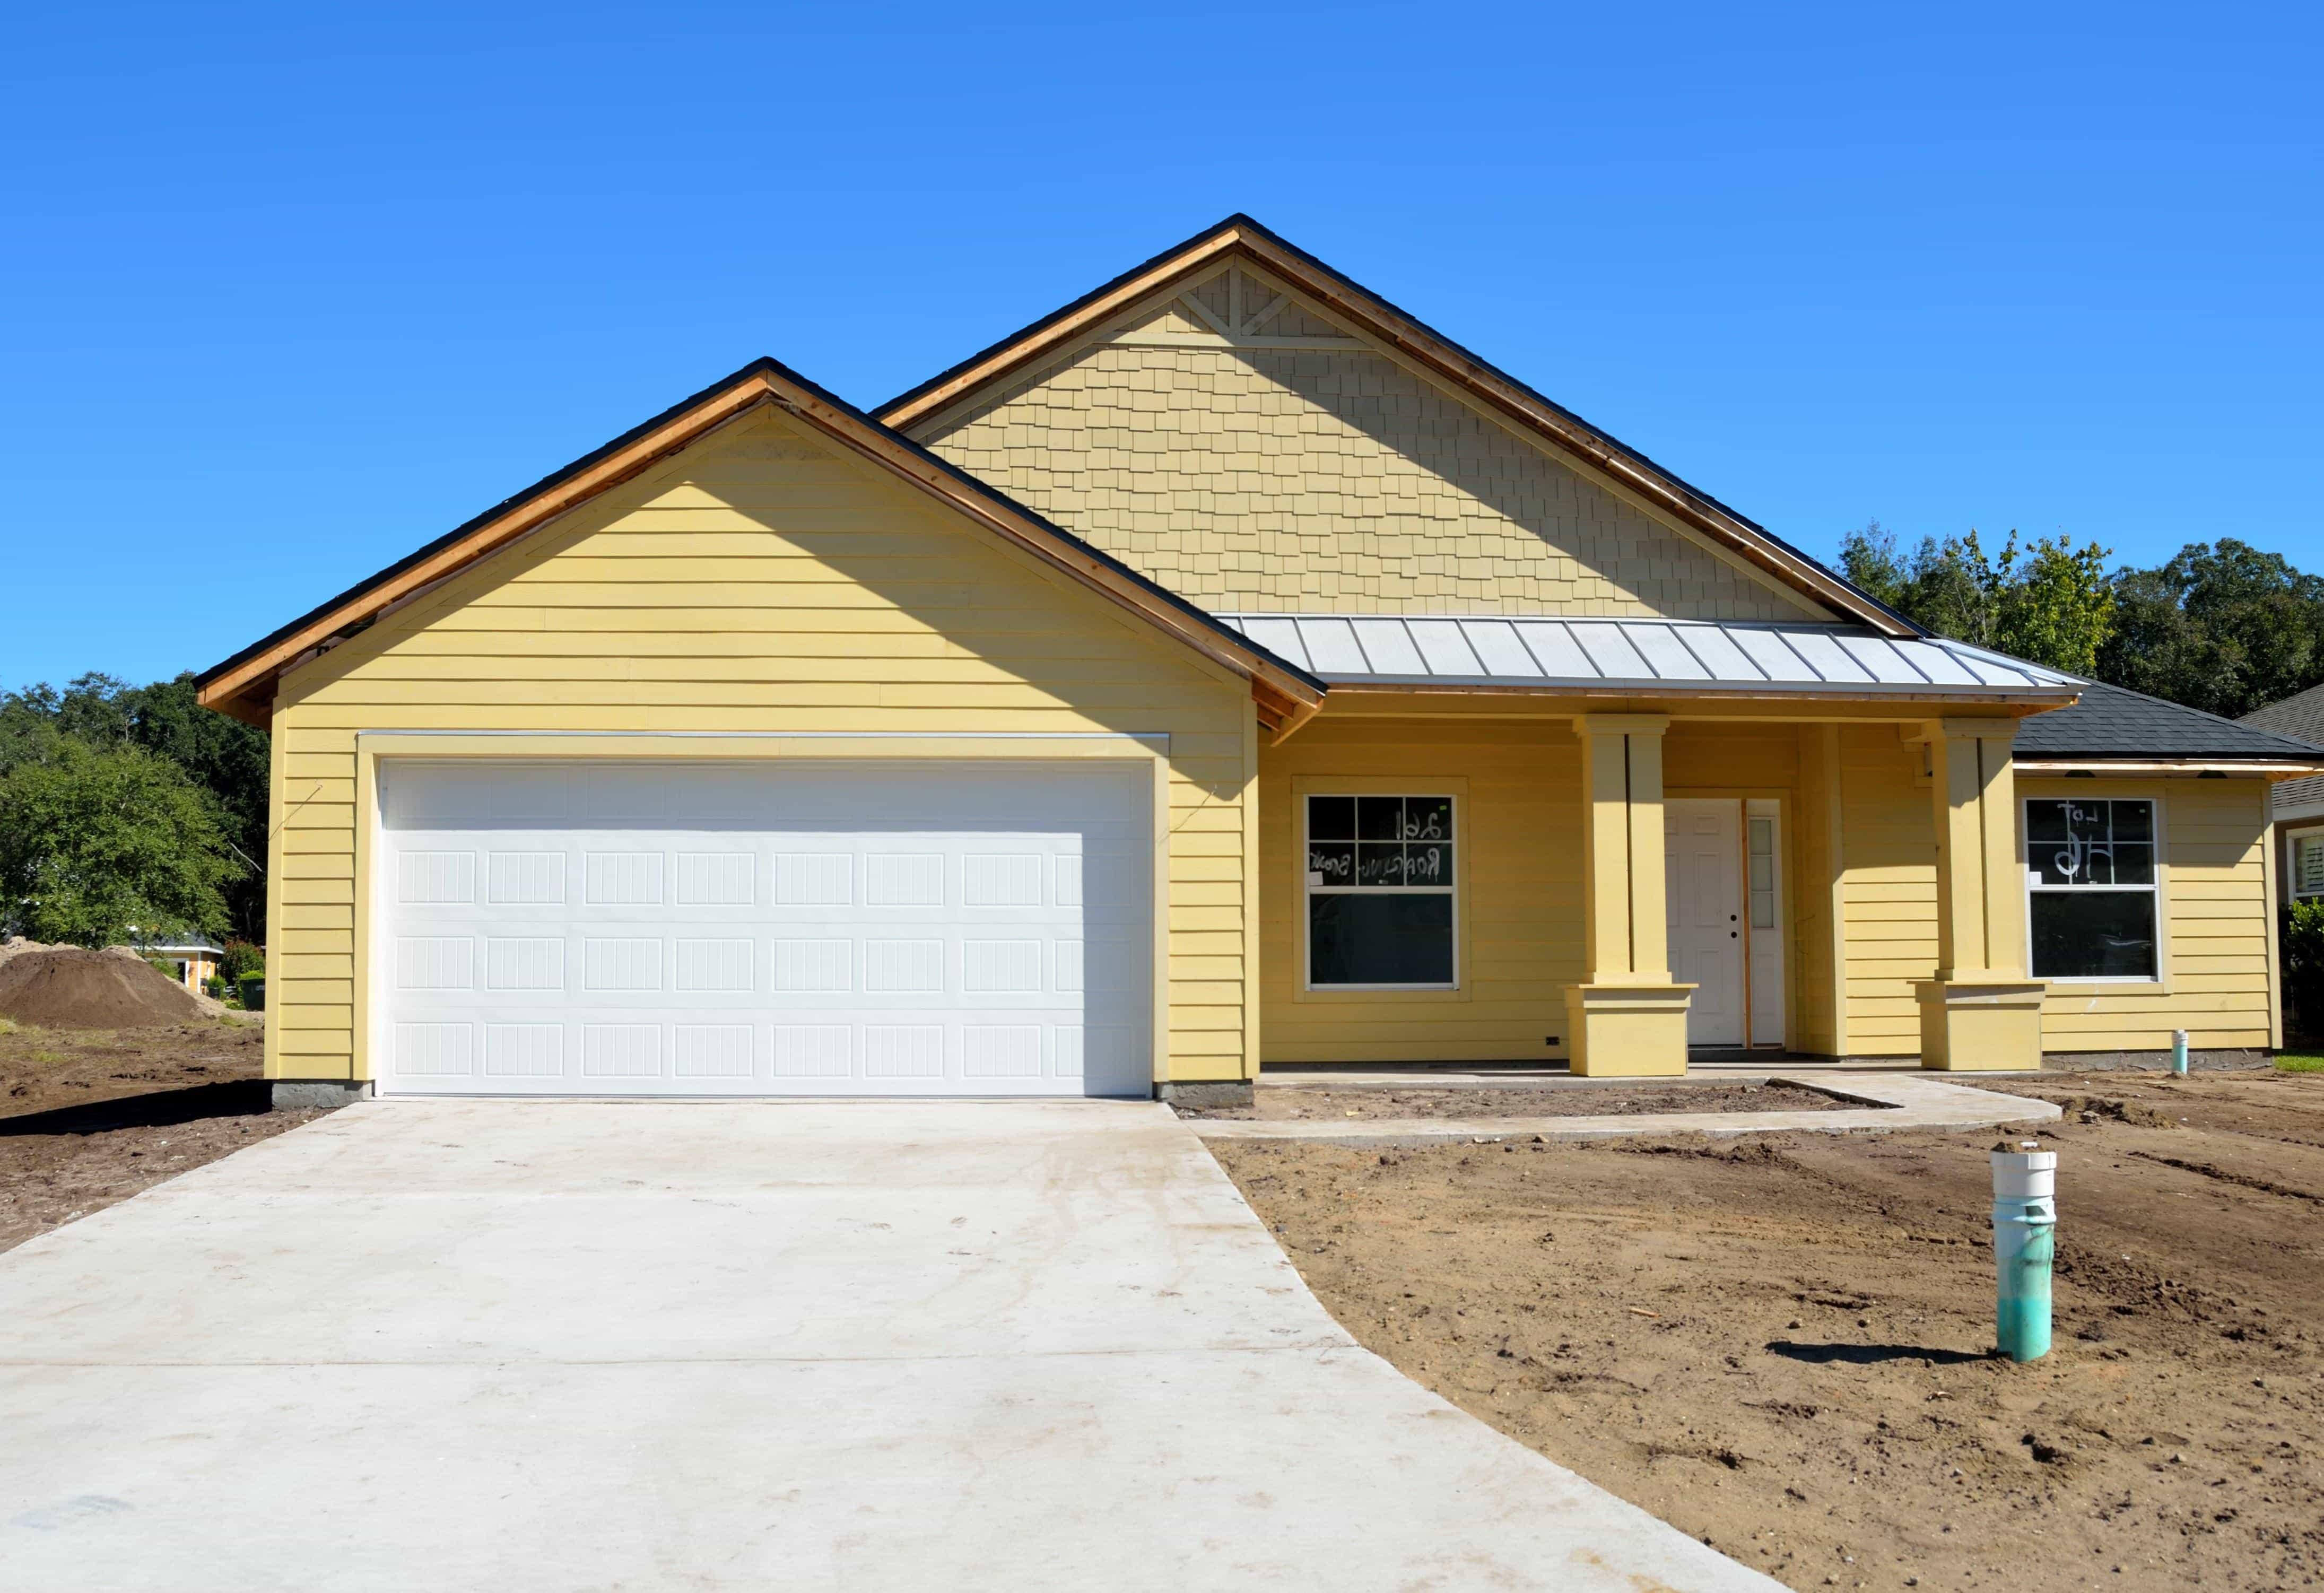 House, Construction, Porch, Urban, Facade, Home, Architecture, Roof, Door,  Window